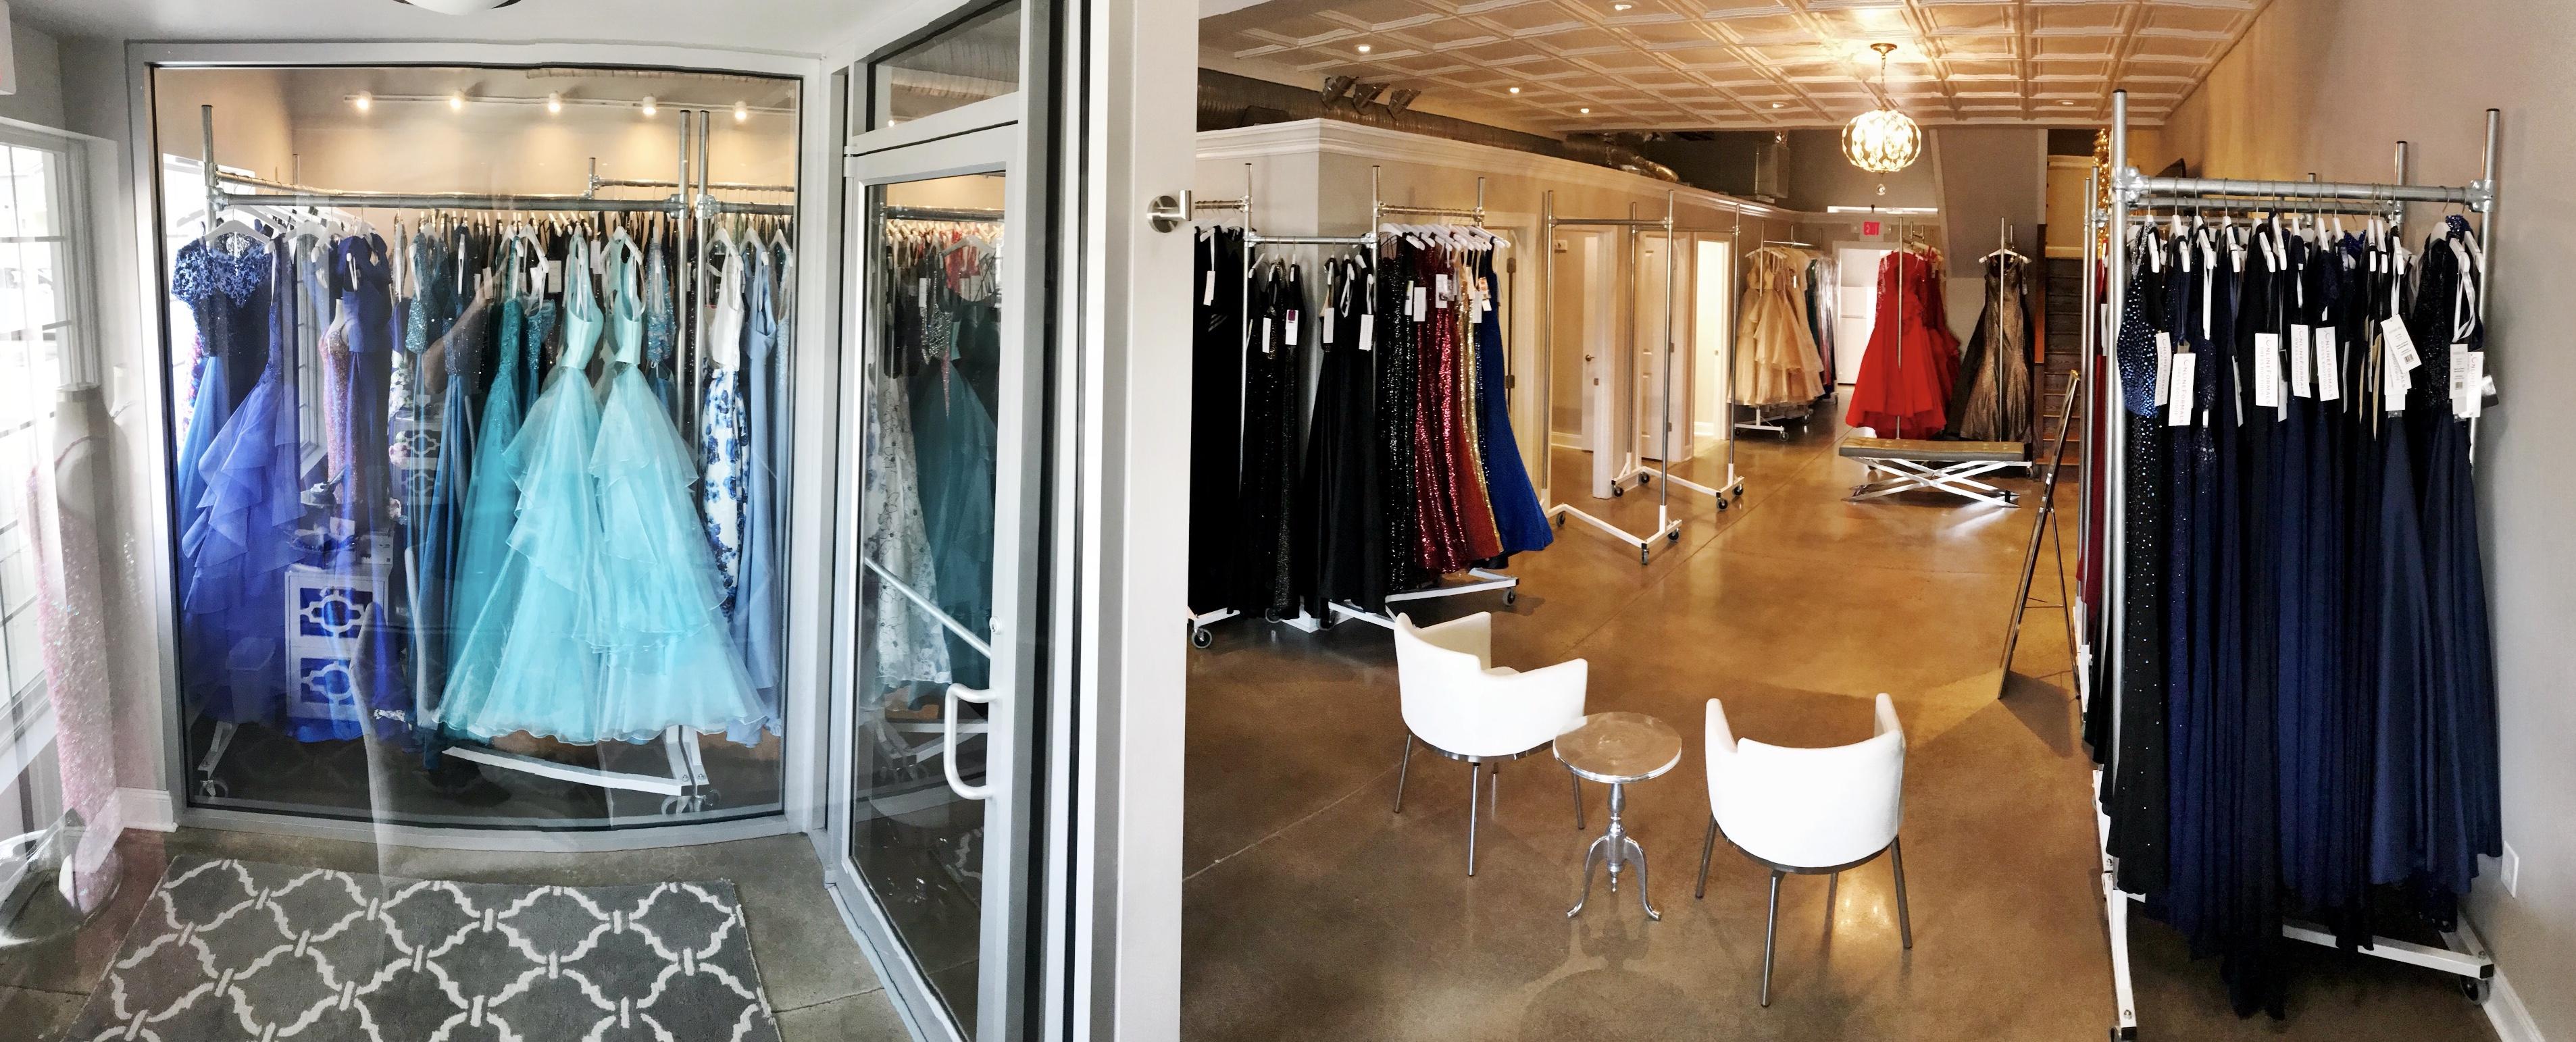 Virginia Beach Prom Store | Dress Boutique | Chesapeake | Prom 2019